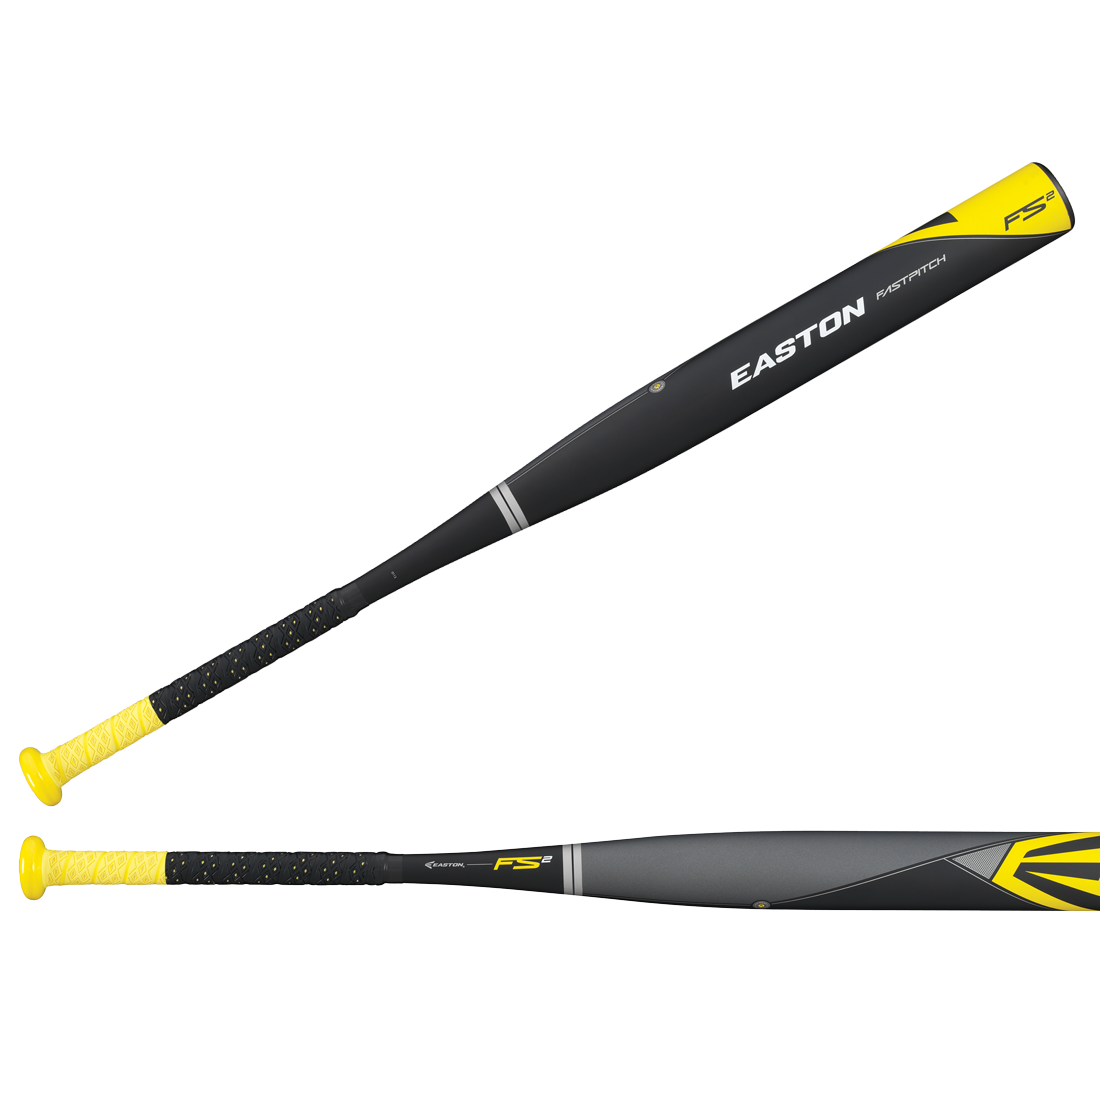 Softball Bat Png ? #71137.